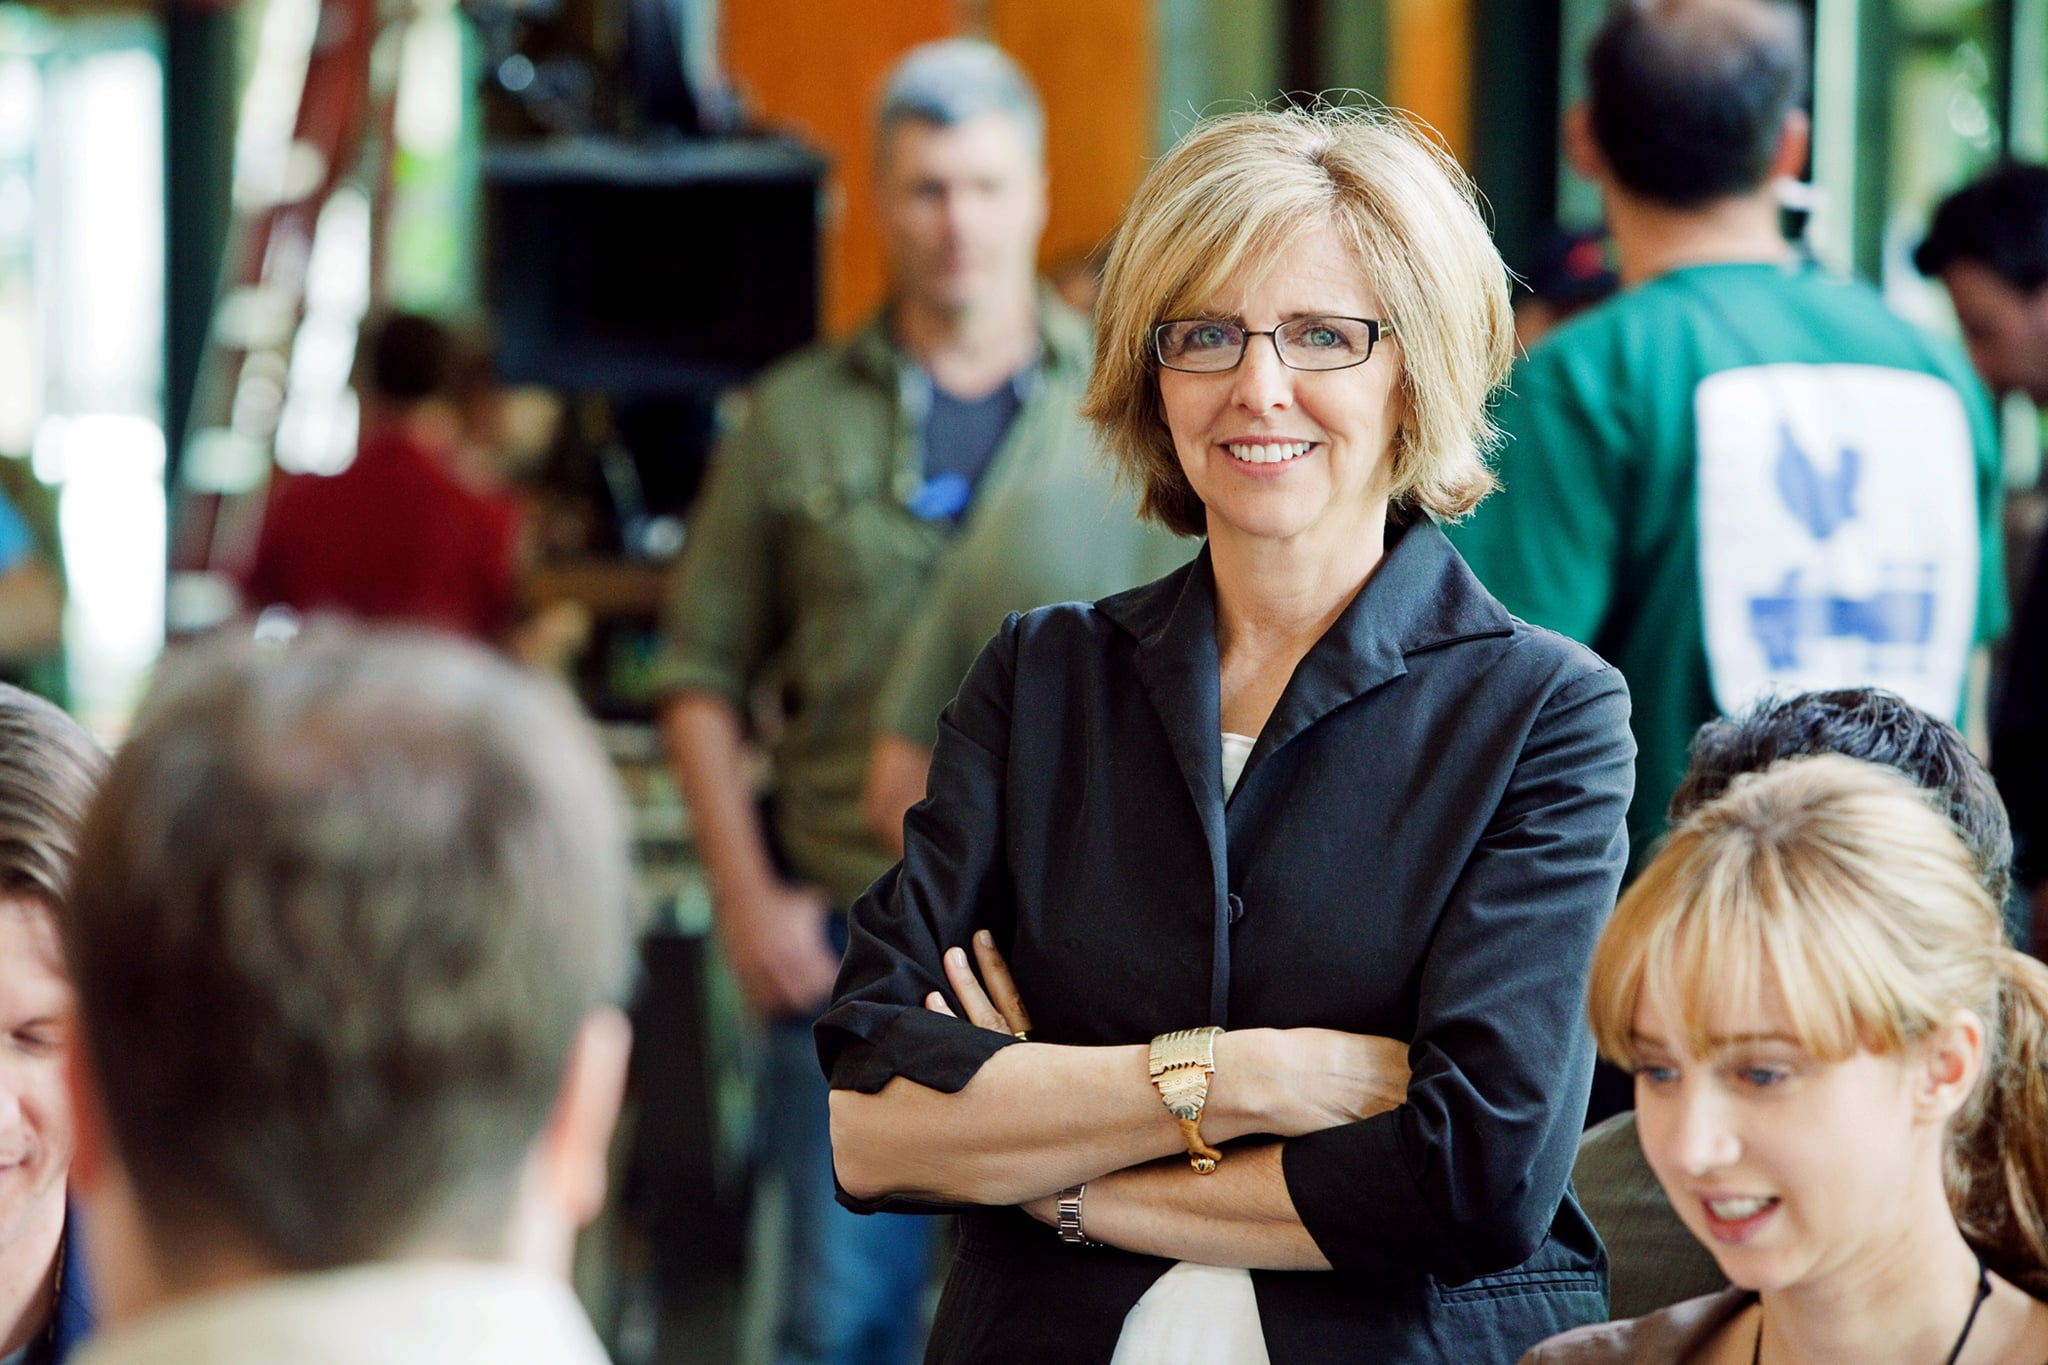 IT'S COMPLICATED, director Nancy Meyers, on set, 2009. Ph: Melinda Sue Gordon/Universal/Courtesy Everett Collection